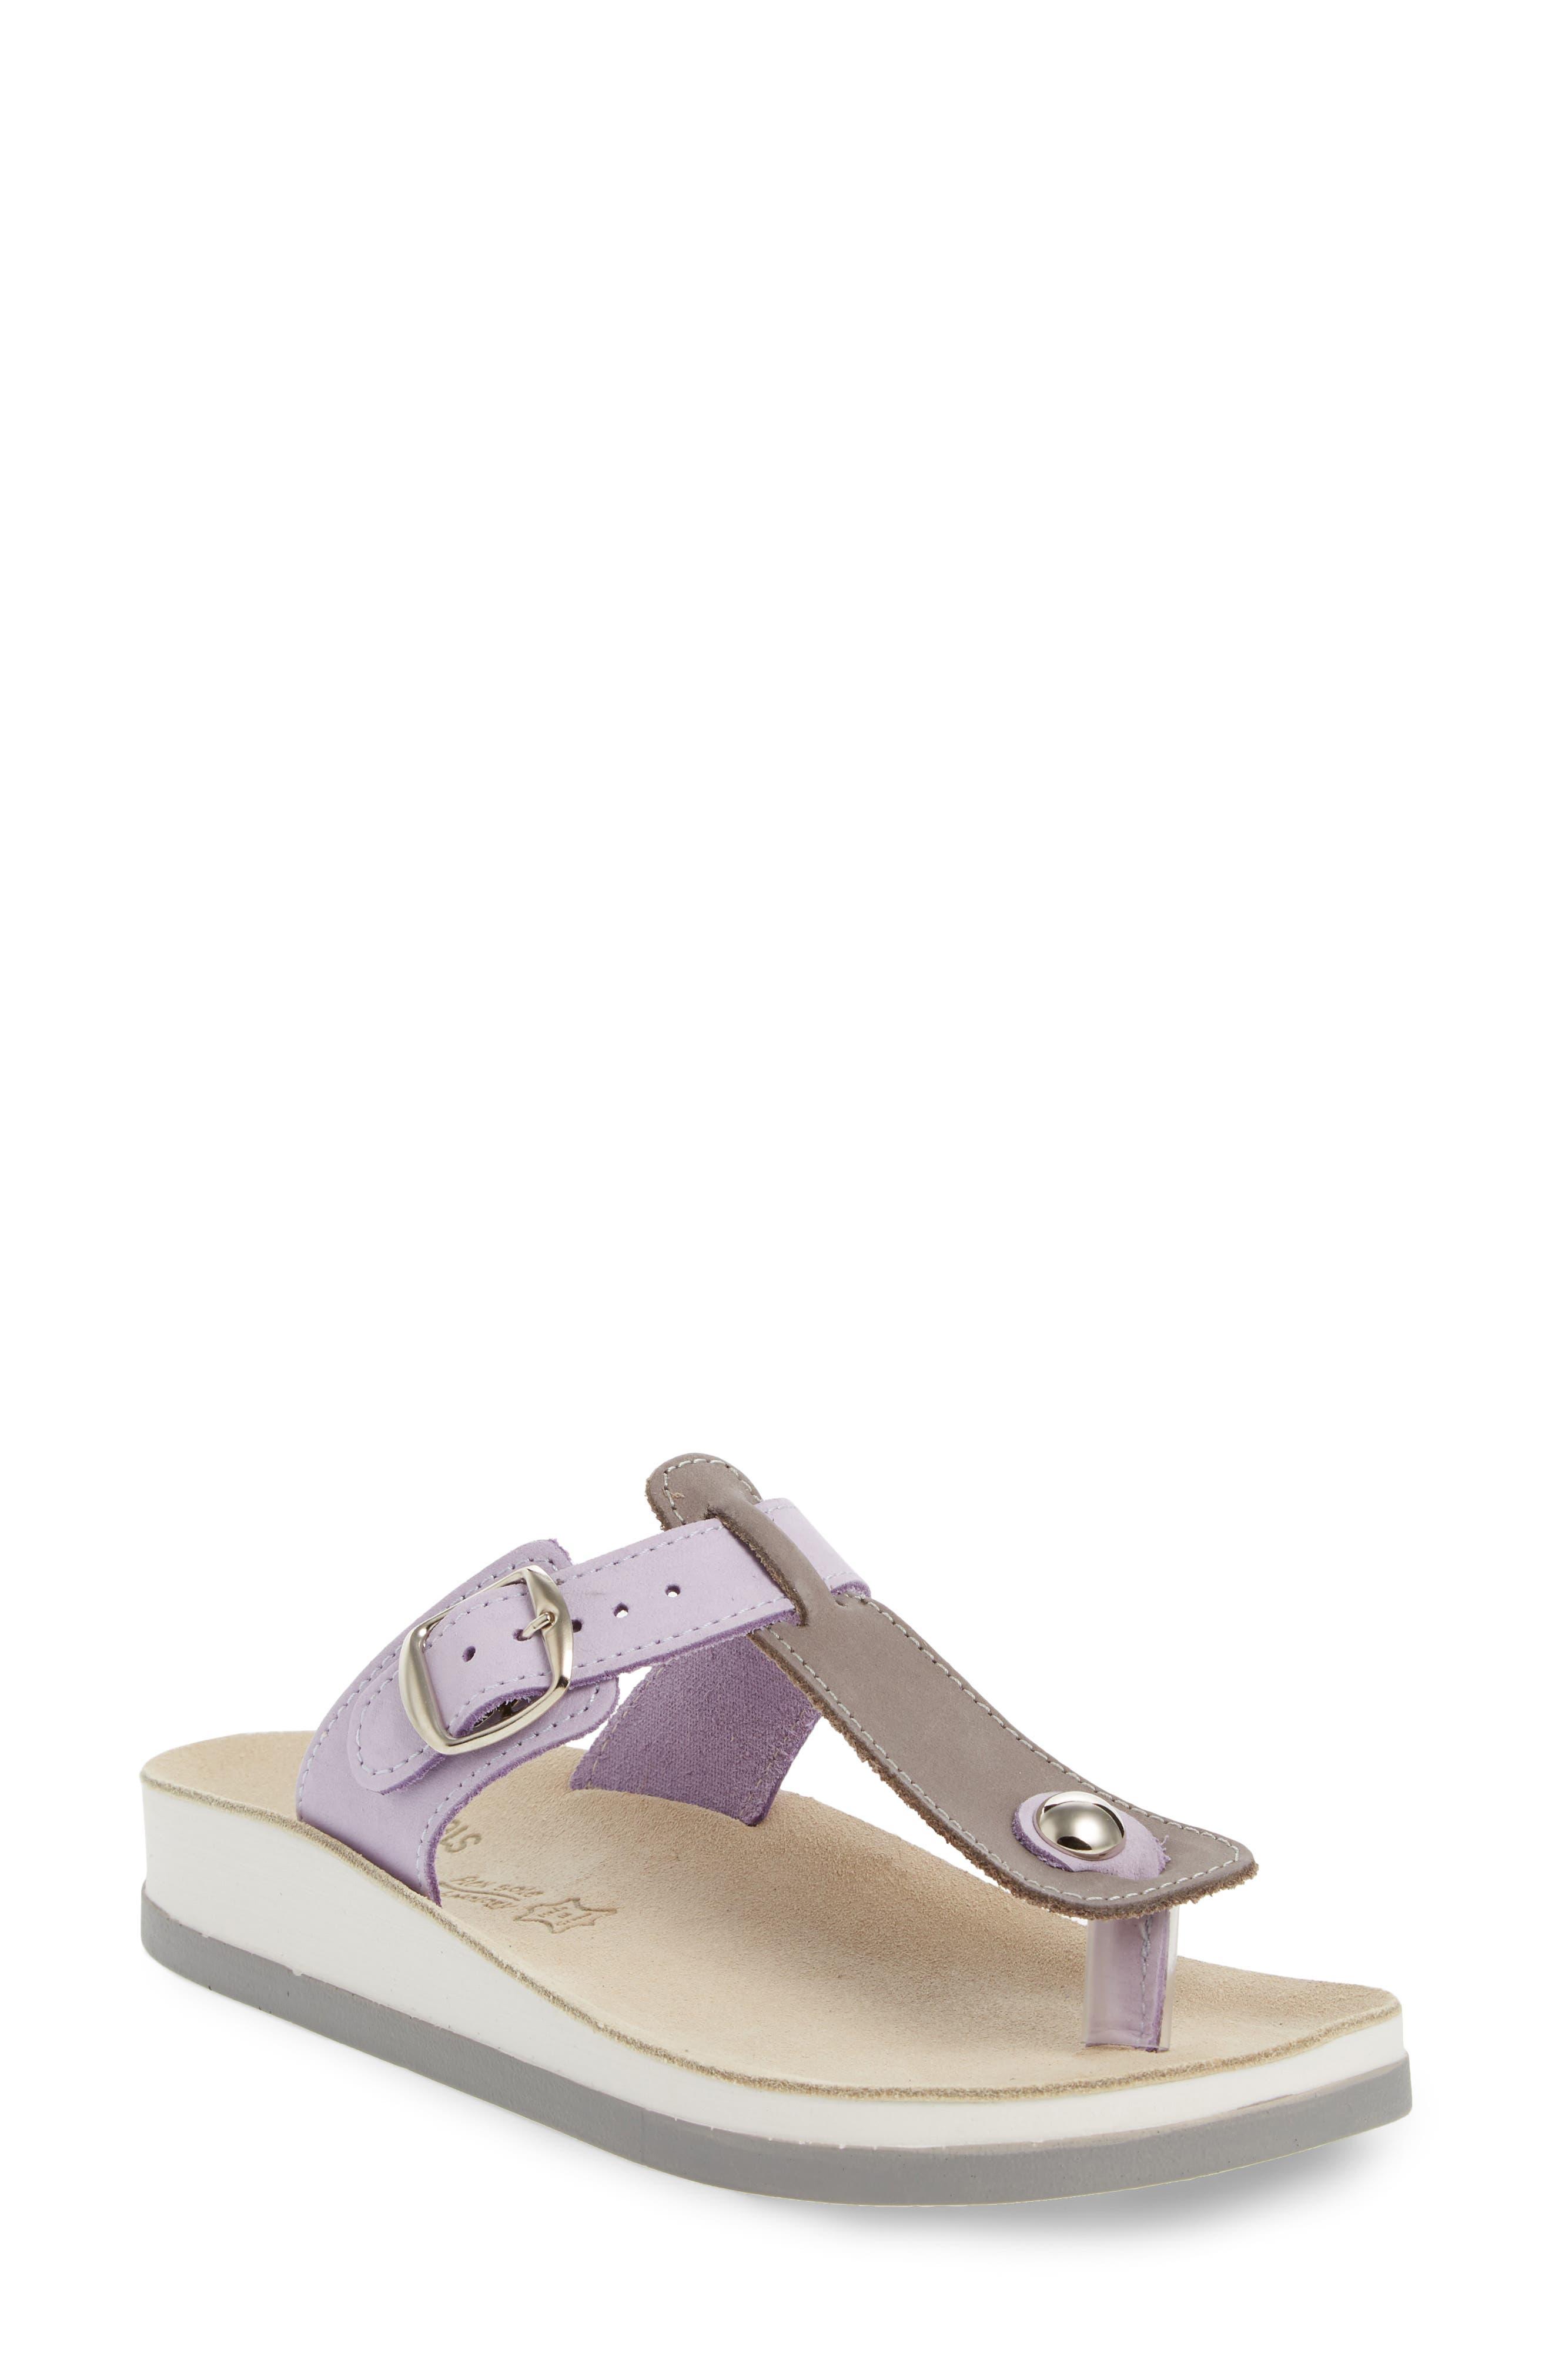 Viola Sandal,                             Main thumbnail 1, color,                             Lila Grey Leather